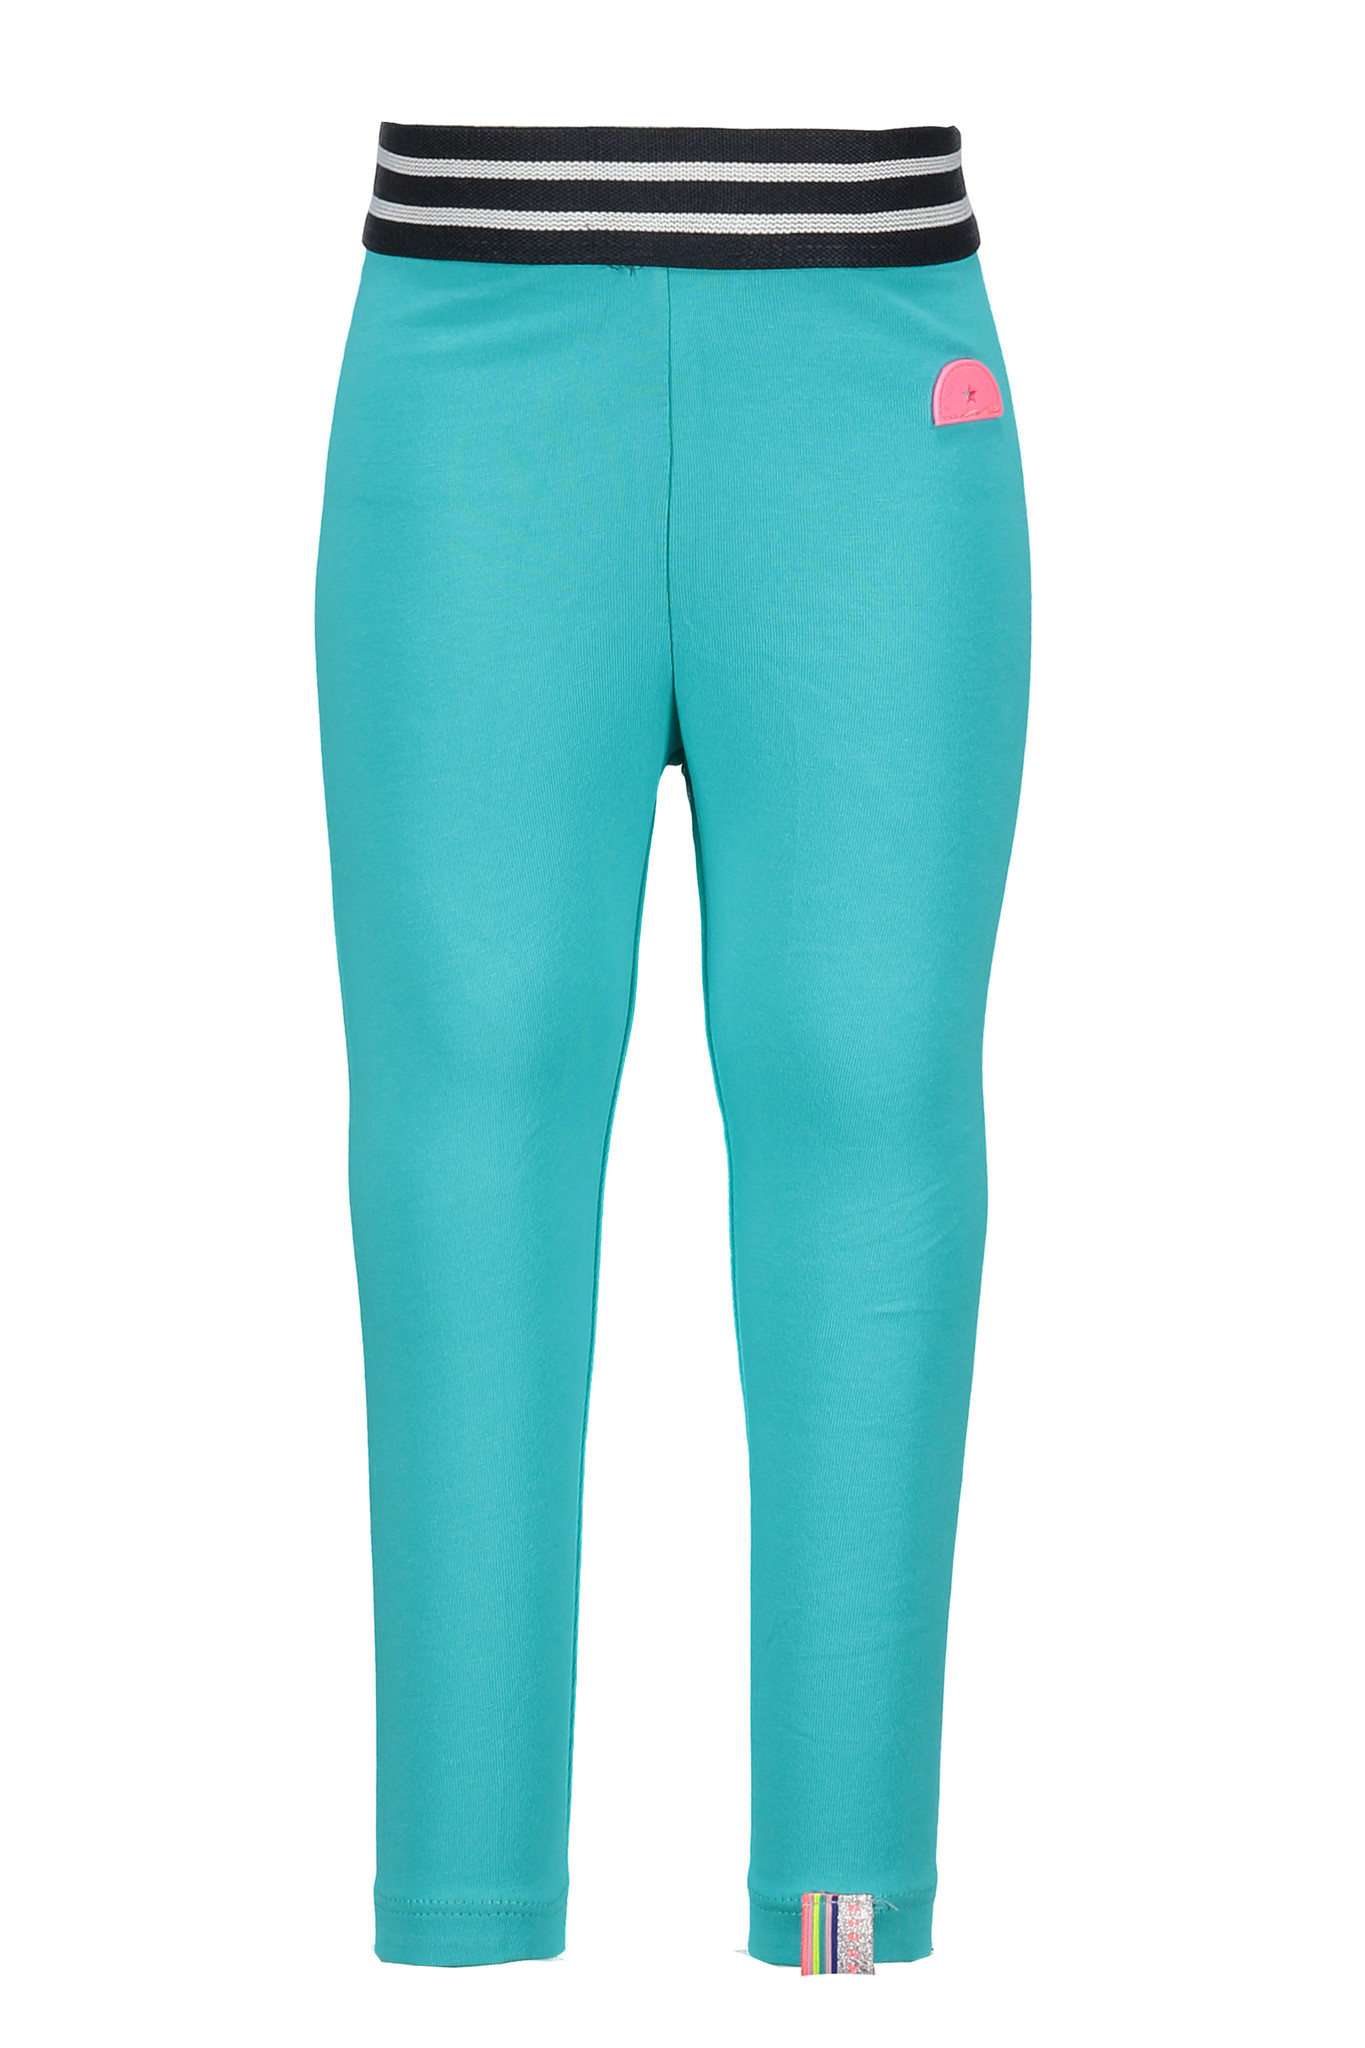 B.Nosy B.Nosy legging mini hot turquoise